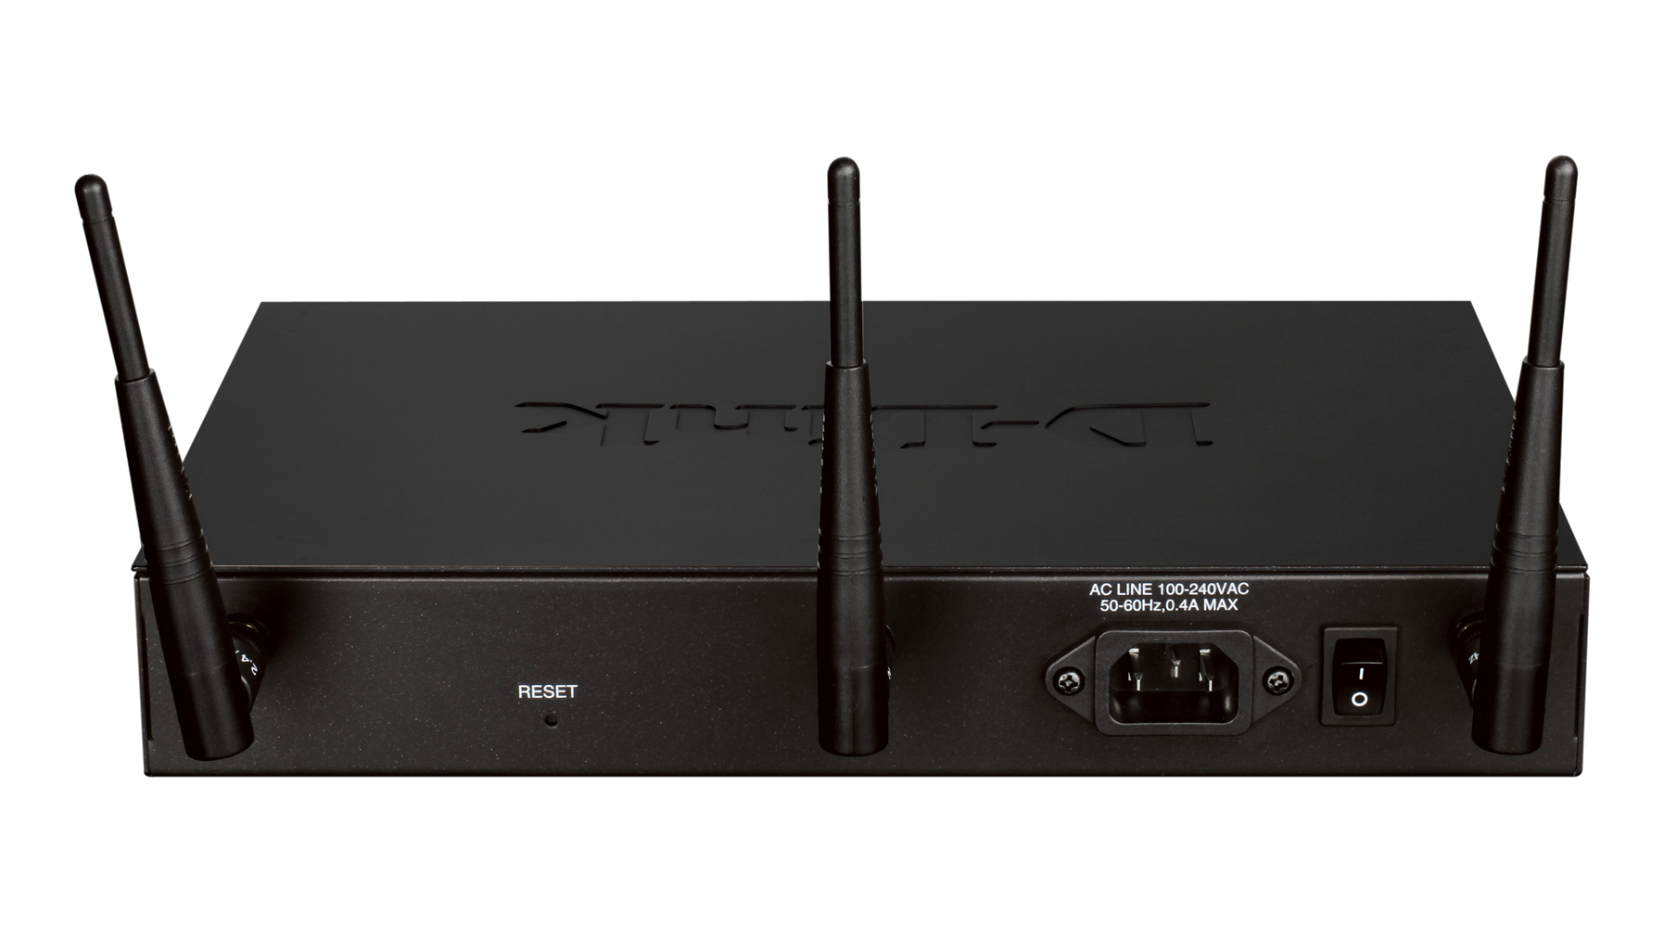 D-Link DSR-1000N Wireless Router Drivers Windows XP